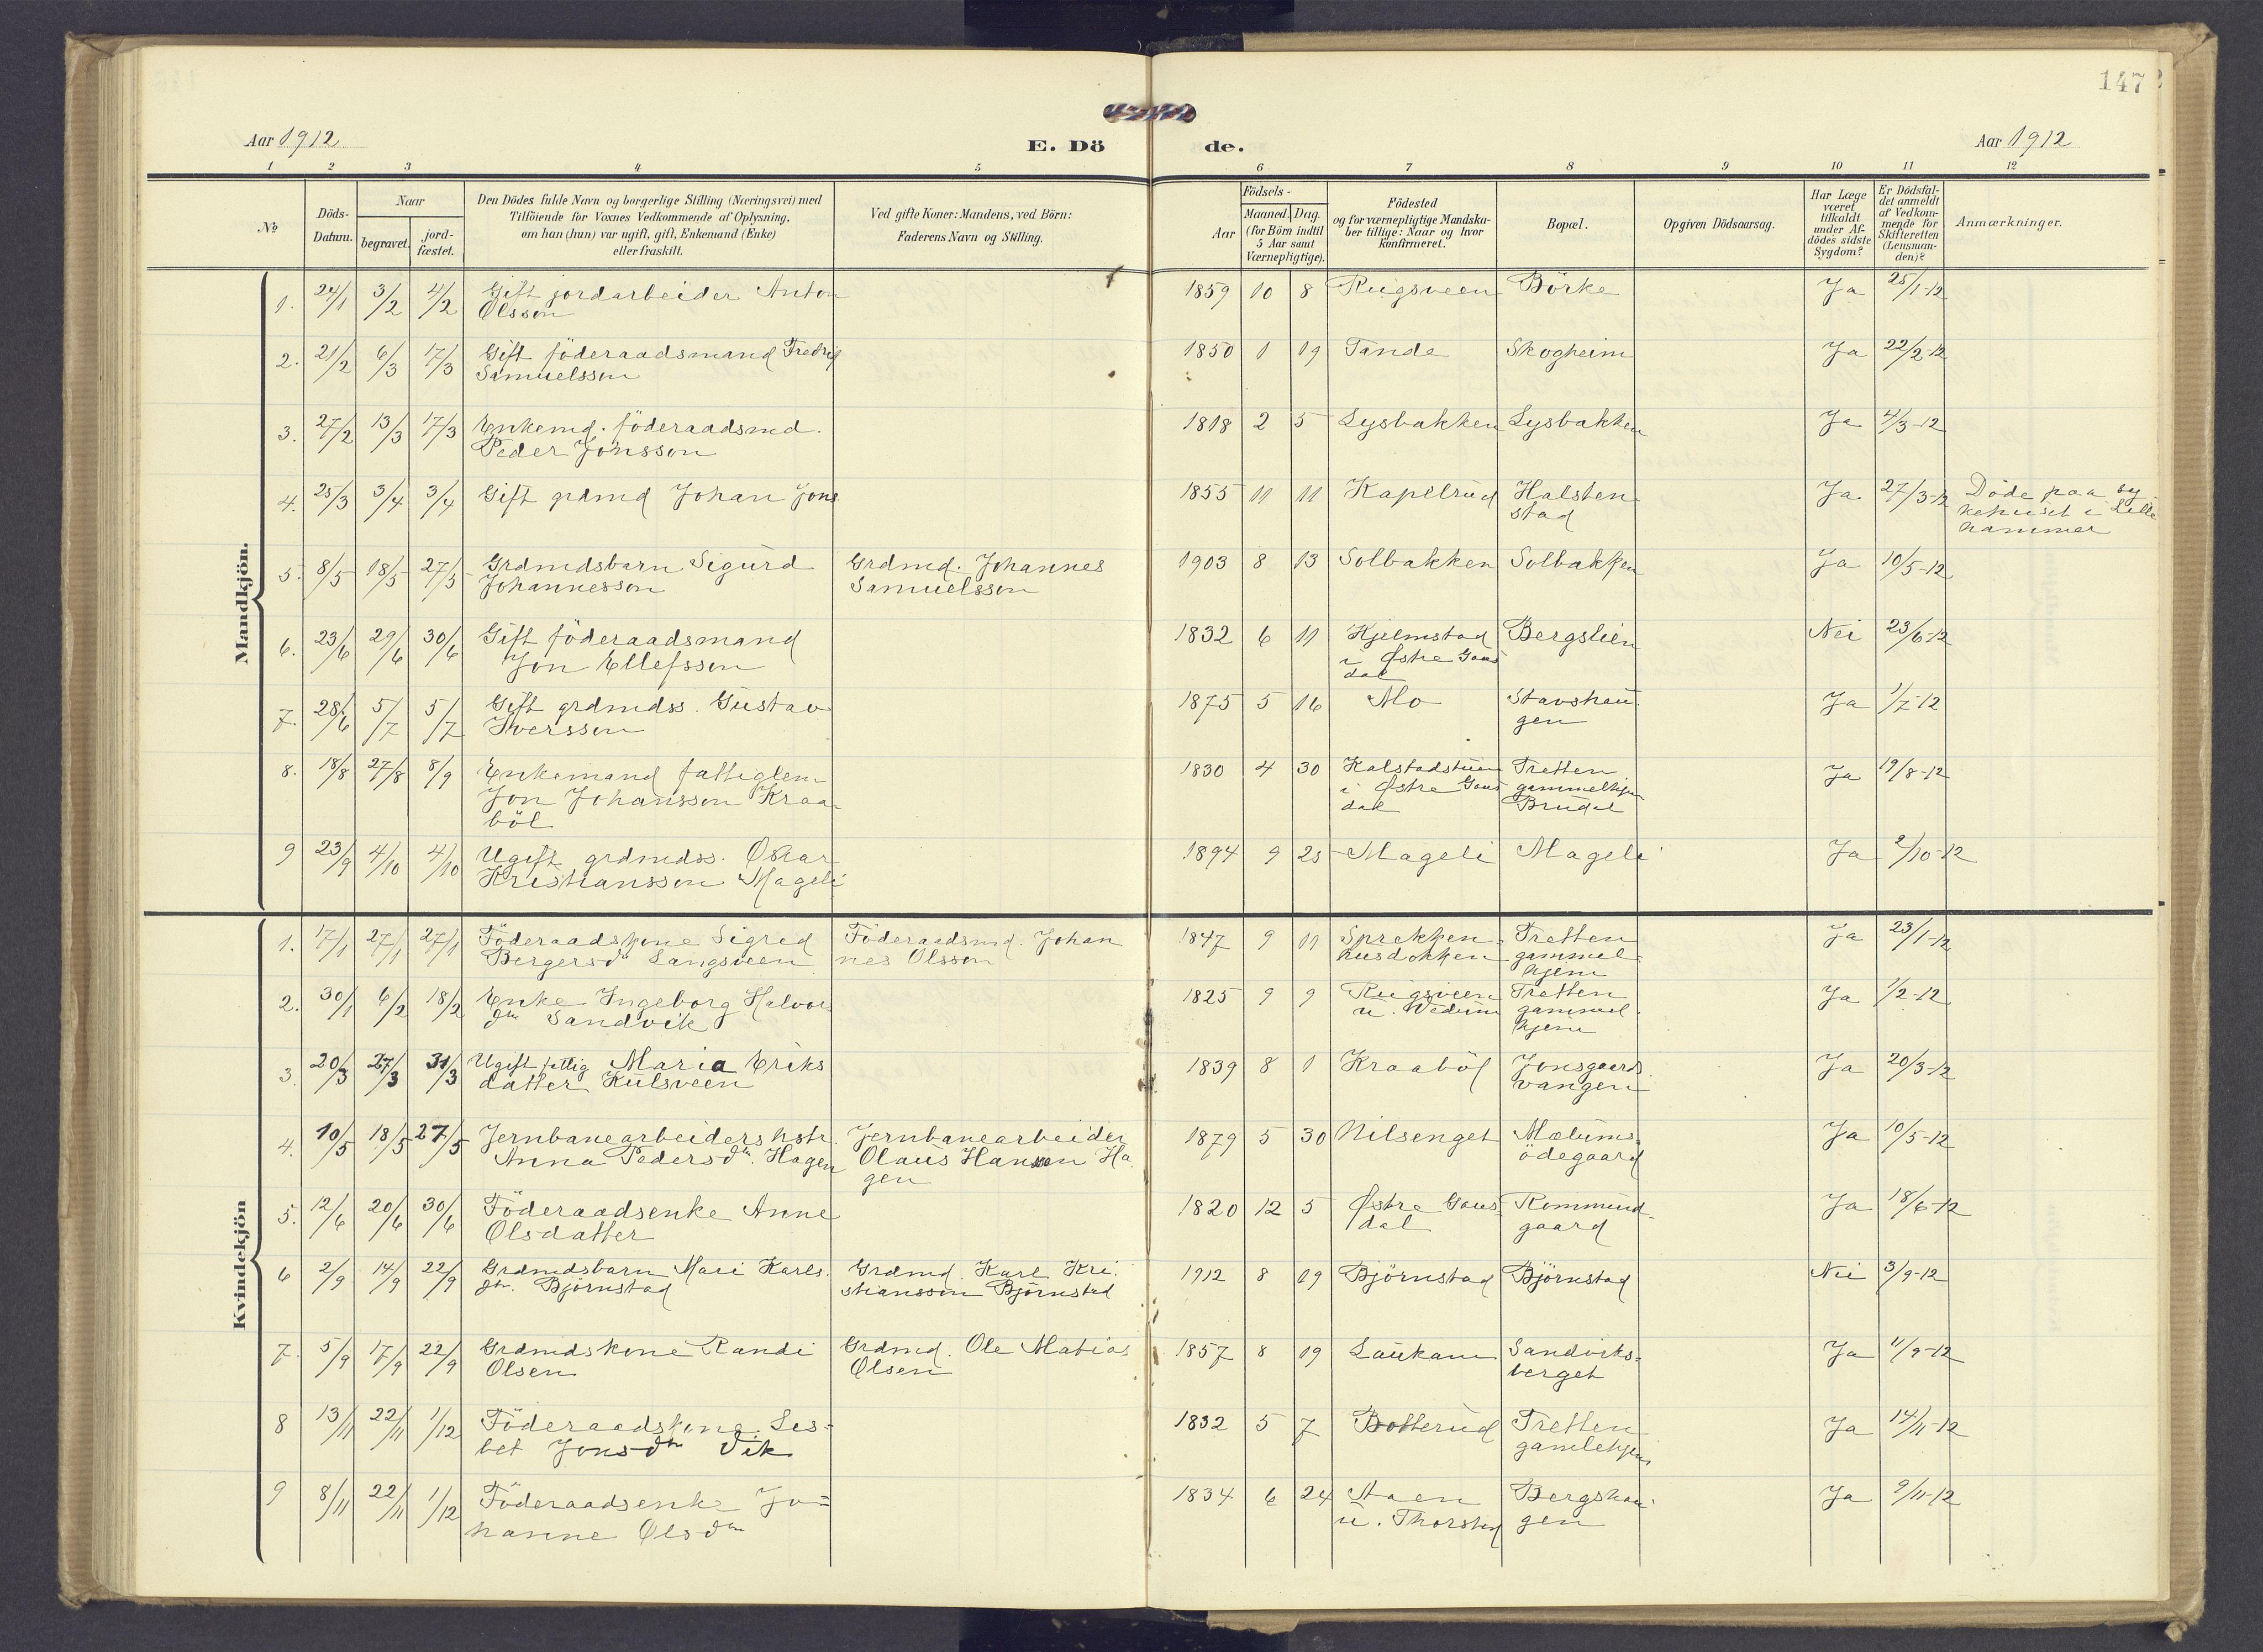 SAH, Øyer prestekontor, Ministerialbok nr. 13, 1905-1920, s. 147